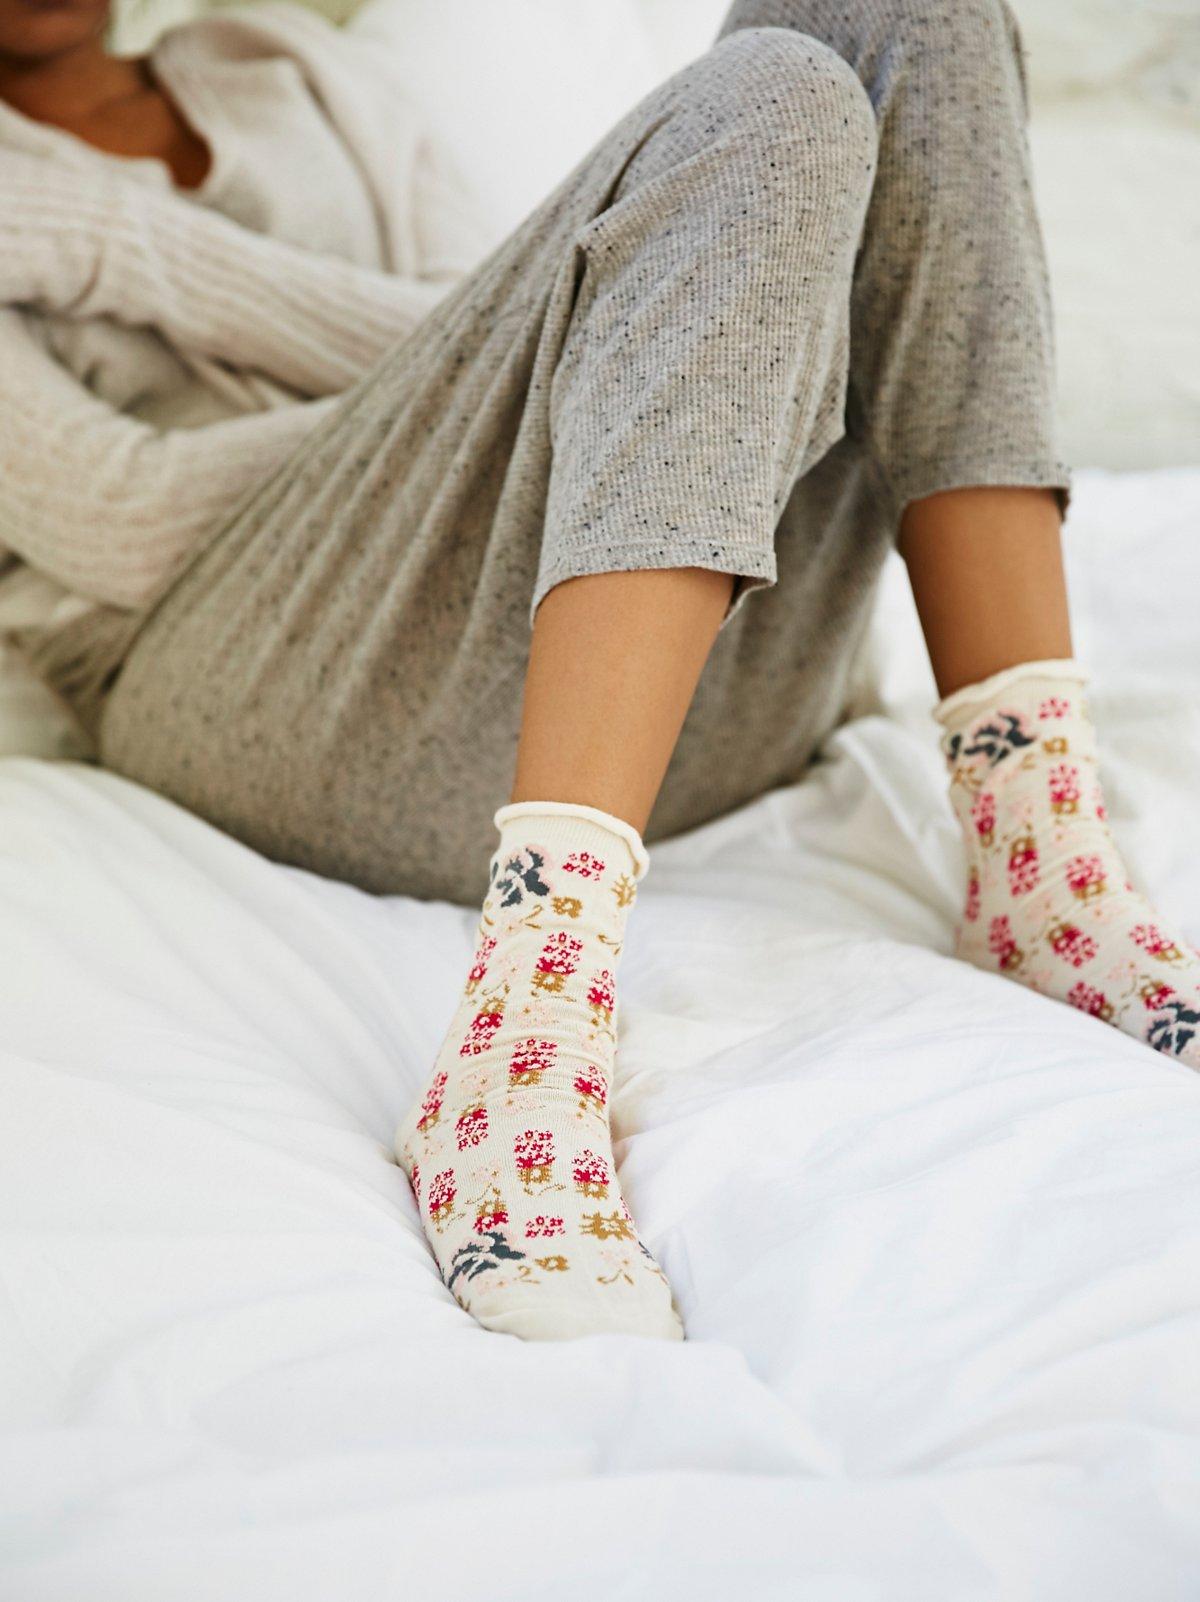 Besos花朵踝袜